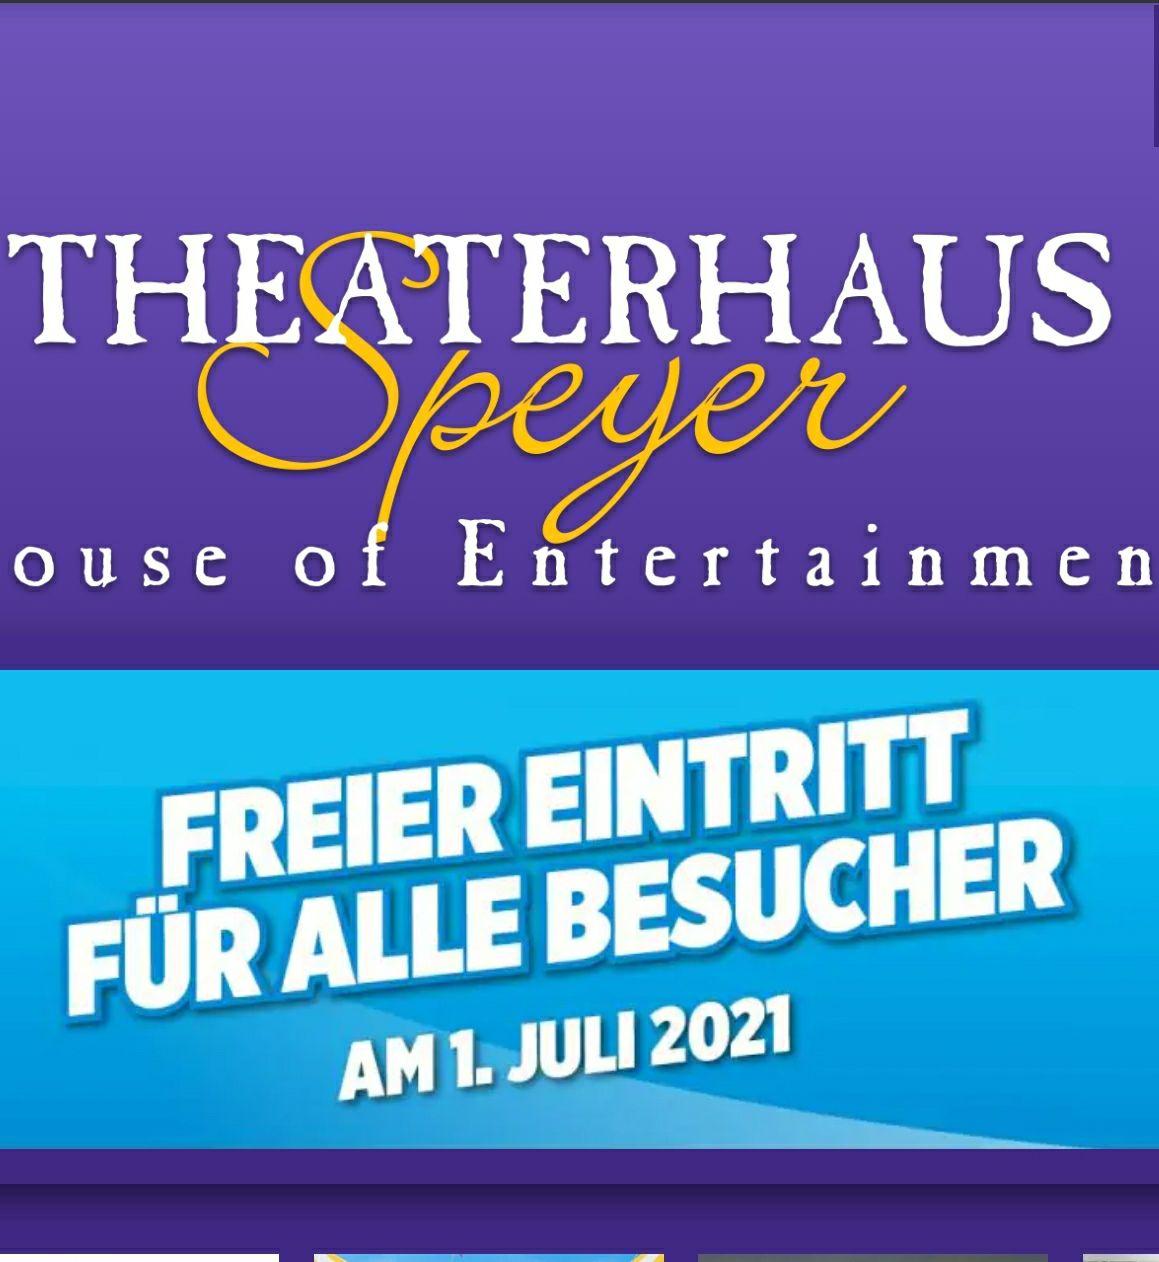 Freier Eintritt am 1.Juli wegen Wiedereröffnung im Kino Theaterhaus Speyer. (Lokal)